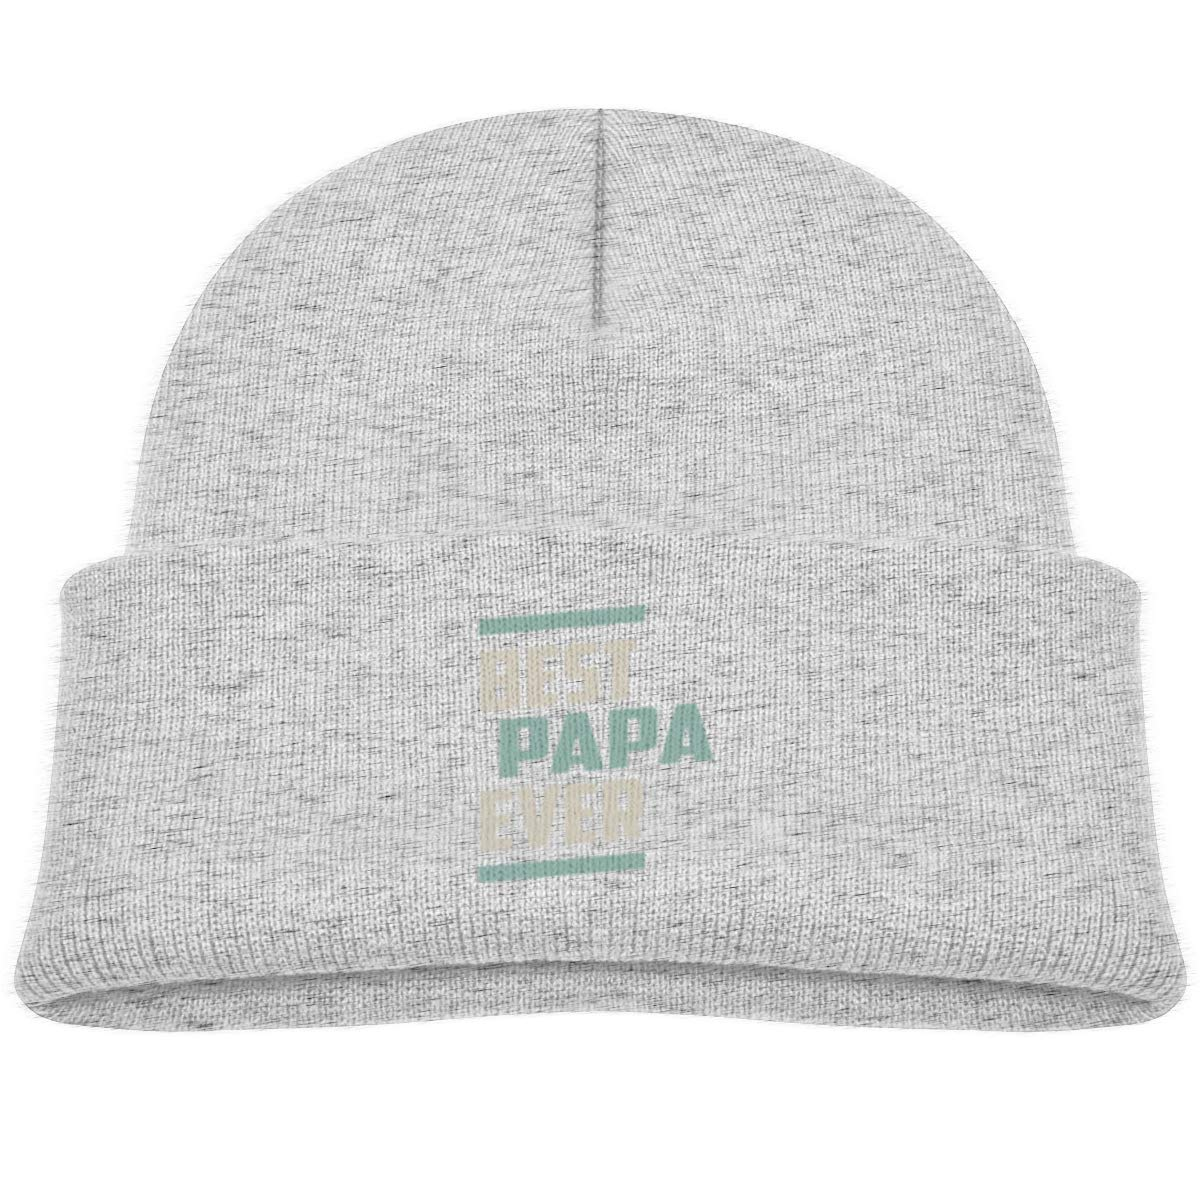 Best Papa Ever Skull Cap Baby Girls Gray